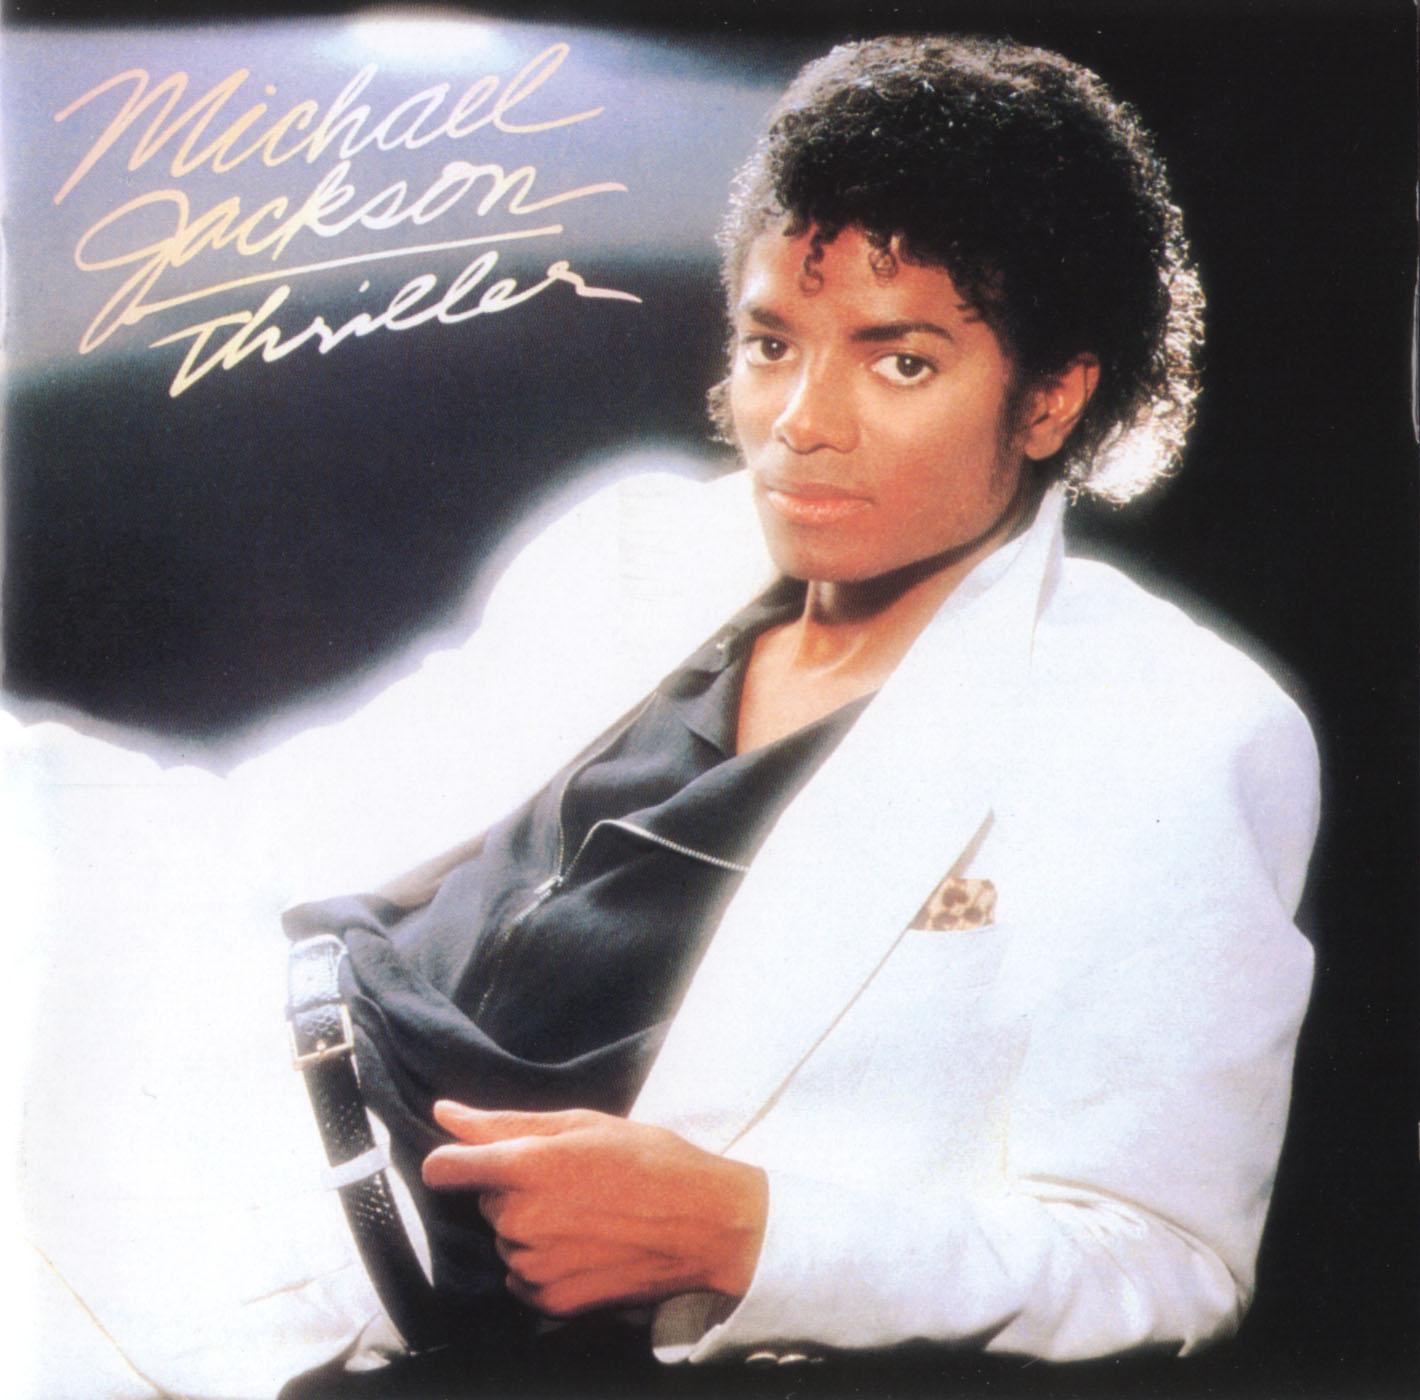 http://1.bp.blogspot.com/-mOBn6NyXBik/T_IDIvpLhuI/AAAAAAAAAAY/E-lrbPPnQ48/s1600/ThrillerFront.jpg